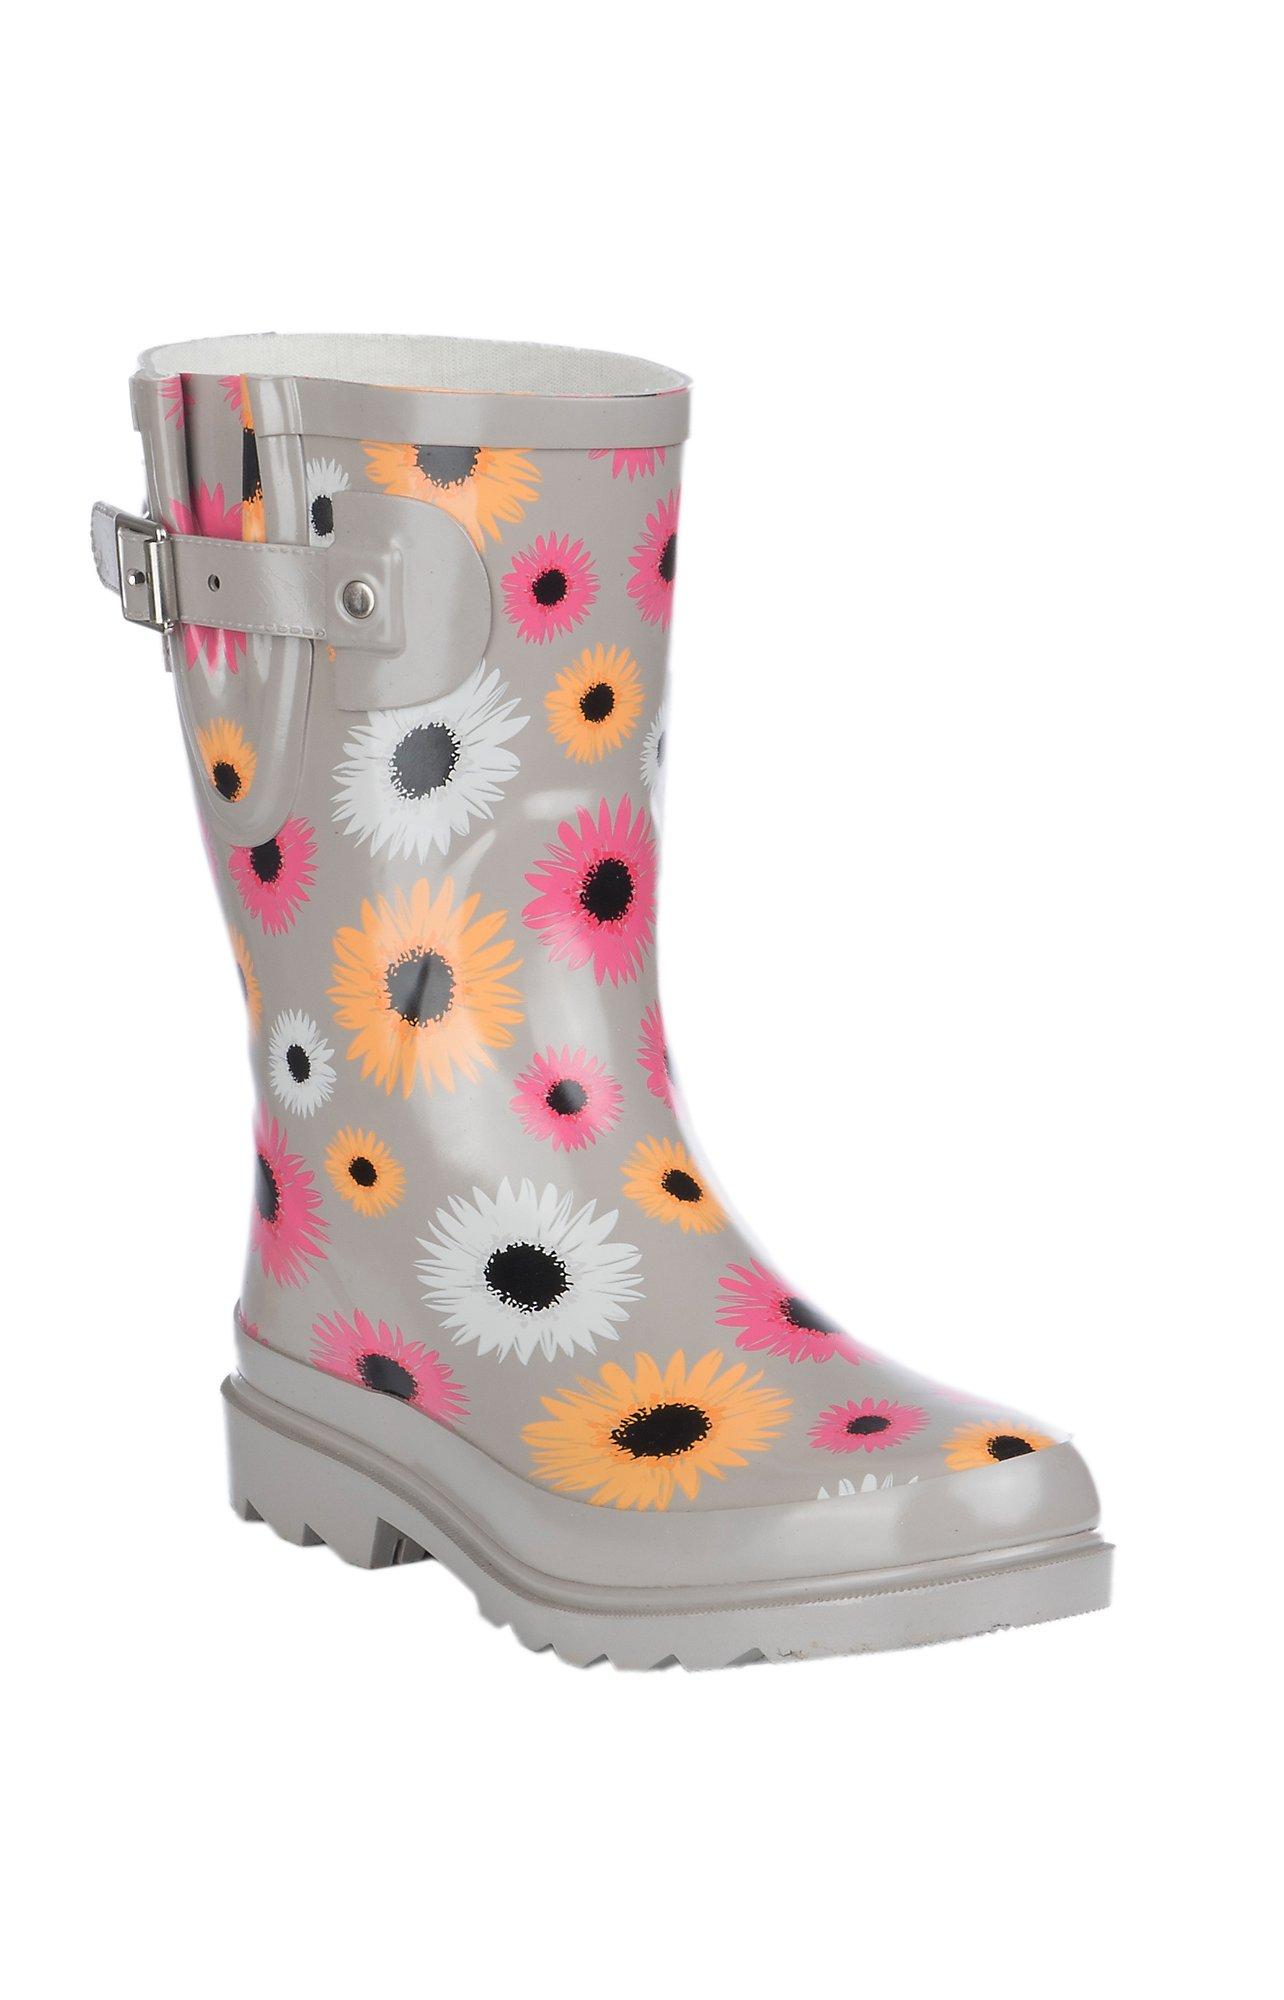 Western Chief Women's Grey Multi-Color Daisy Print Round Toe Rain Boots